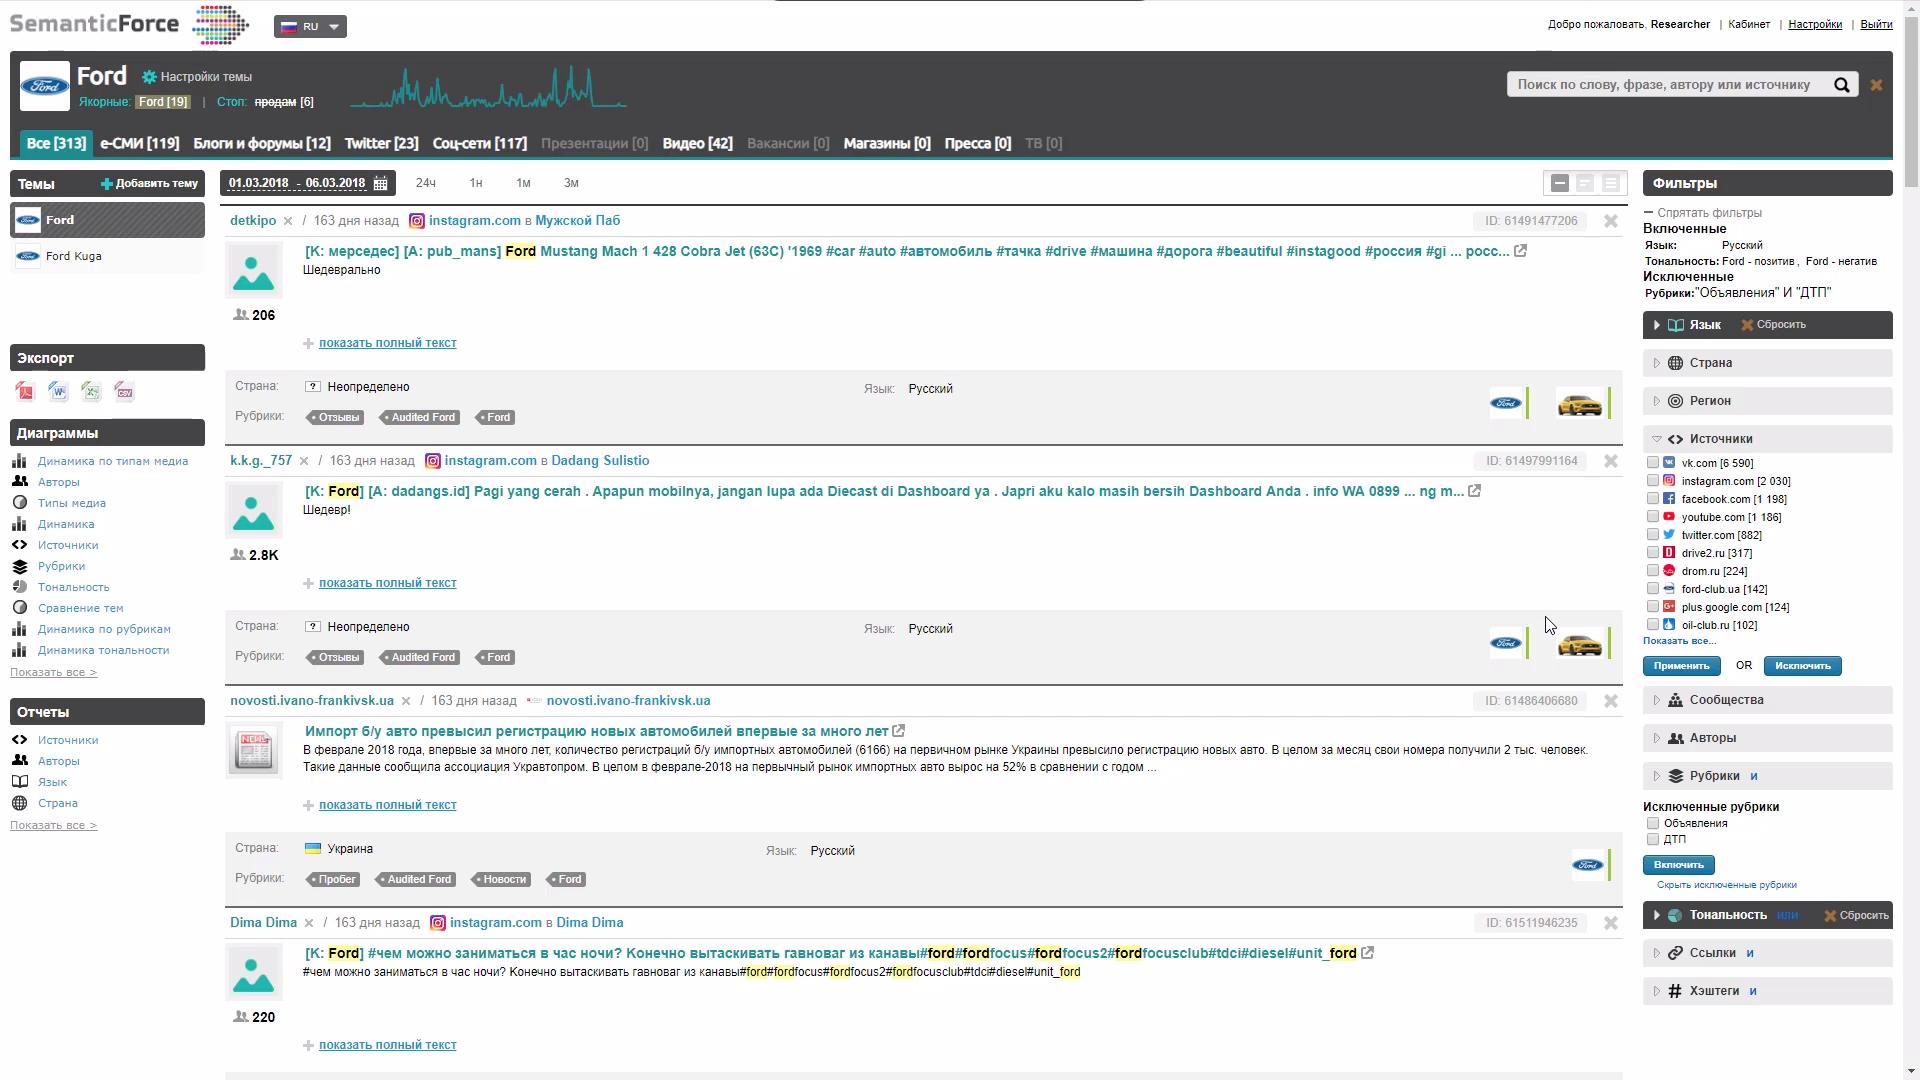 Лента сообщений по заданным теме и параметрам в системе мониторинга и анализа медиа SemanticForce